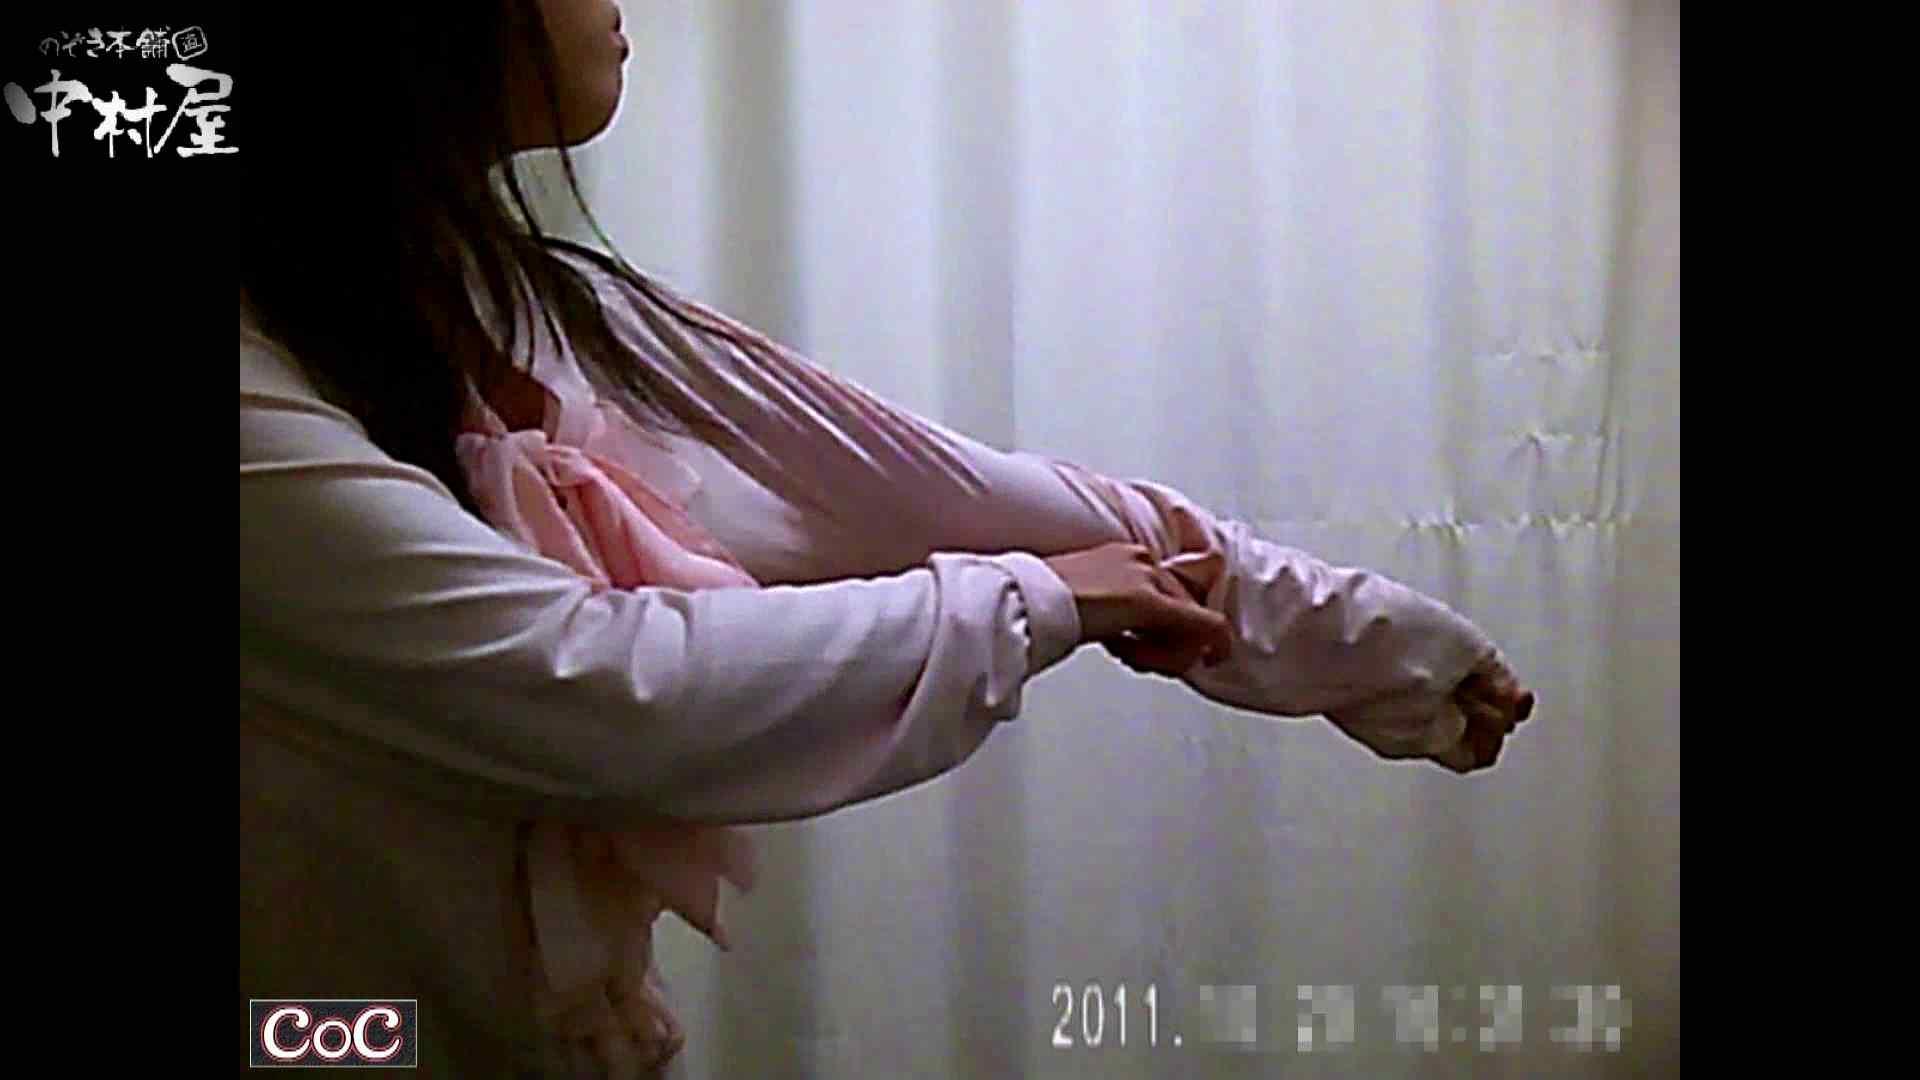 Doctor-X元医者による反抗vol.63後編 OLエロ画像 | 0  109PICs 67